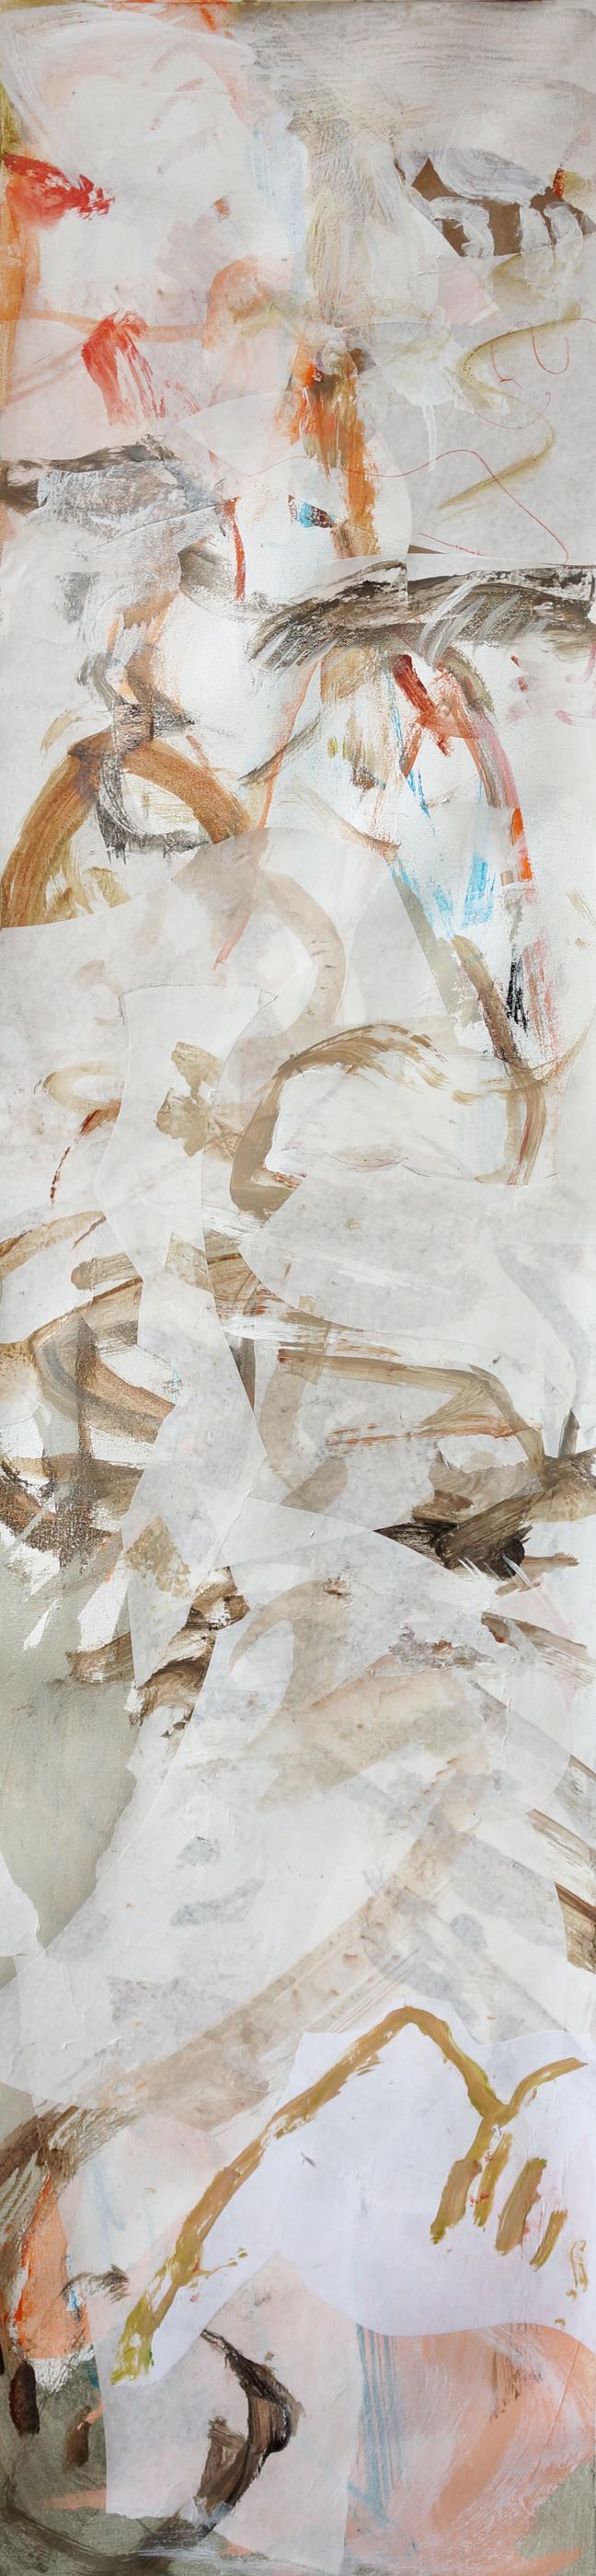 "5/7/13 version of  ni zan creek  66x16""  acrylic & collaged paper on canvas"